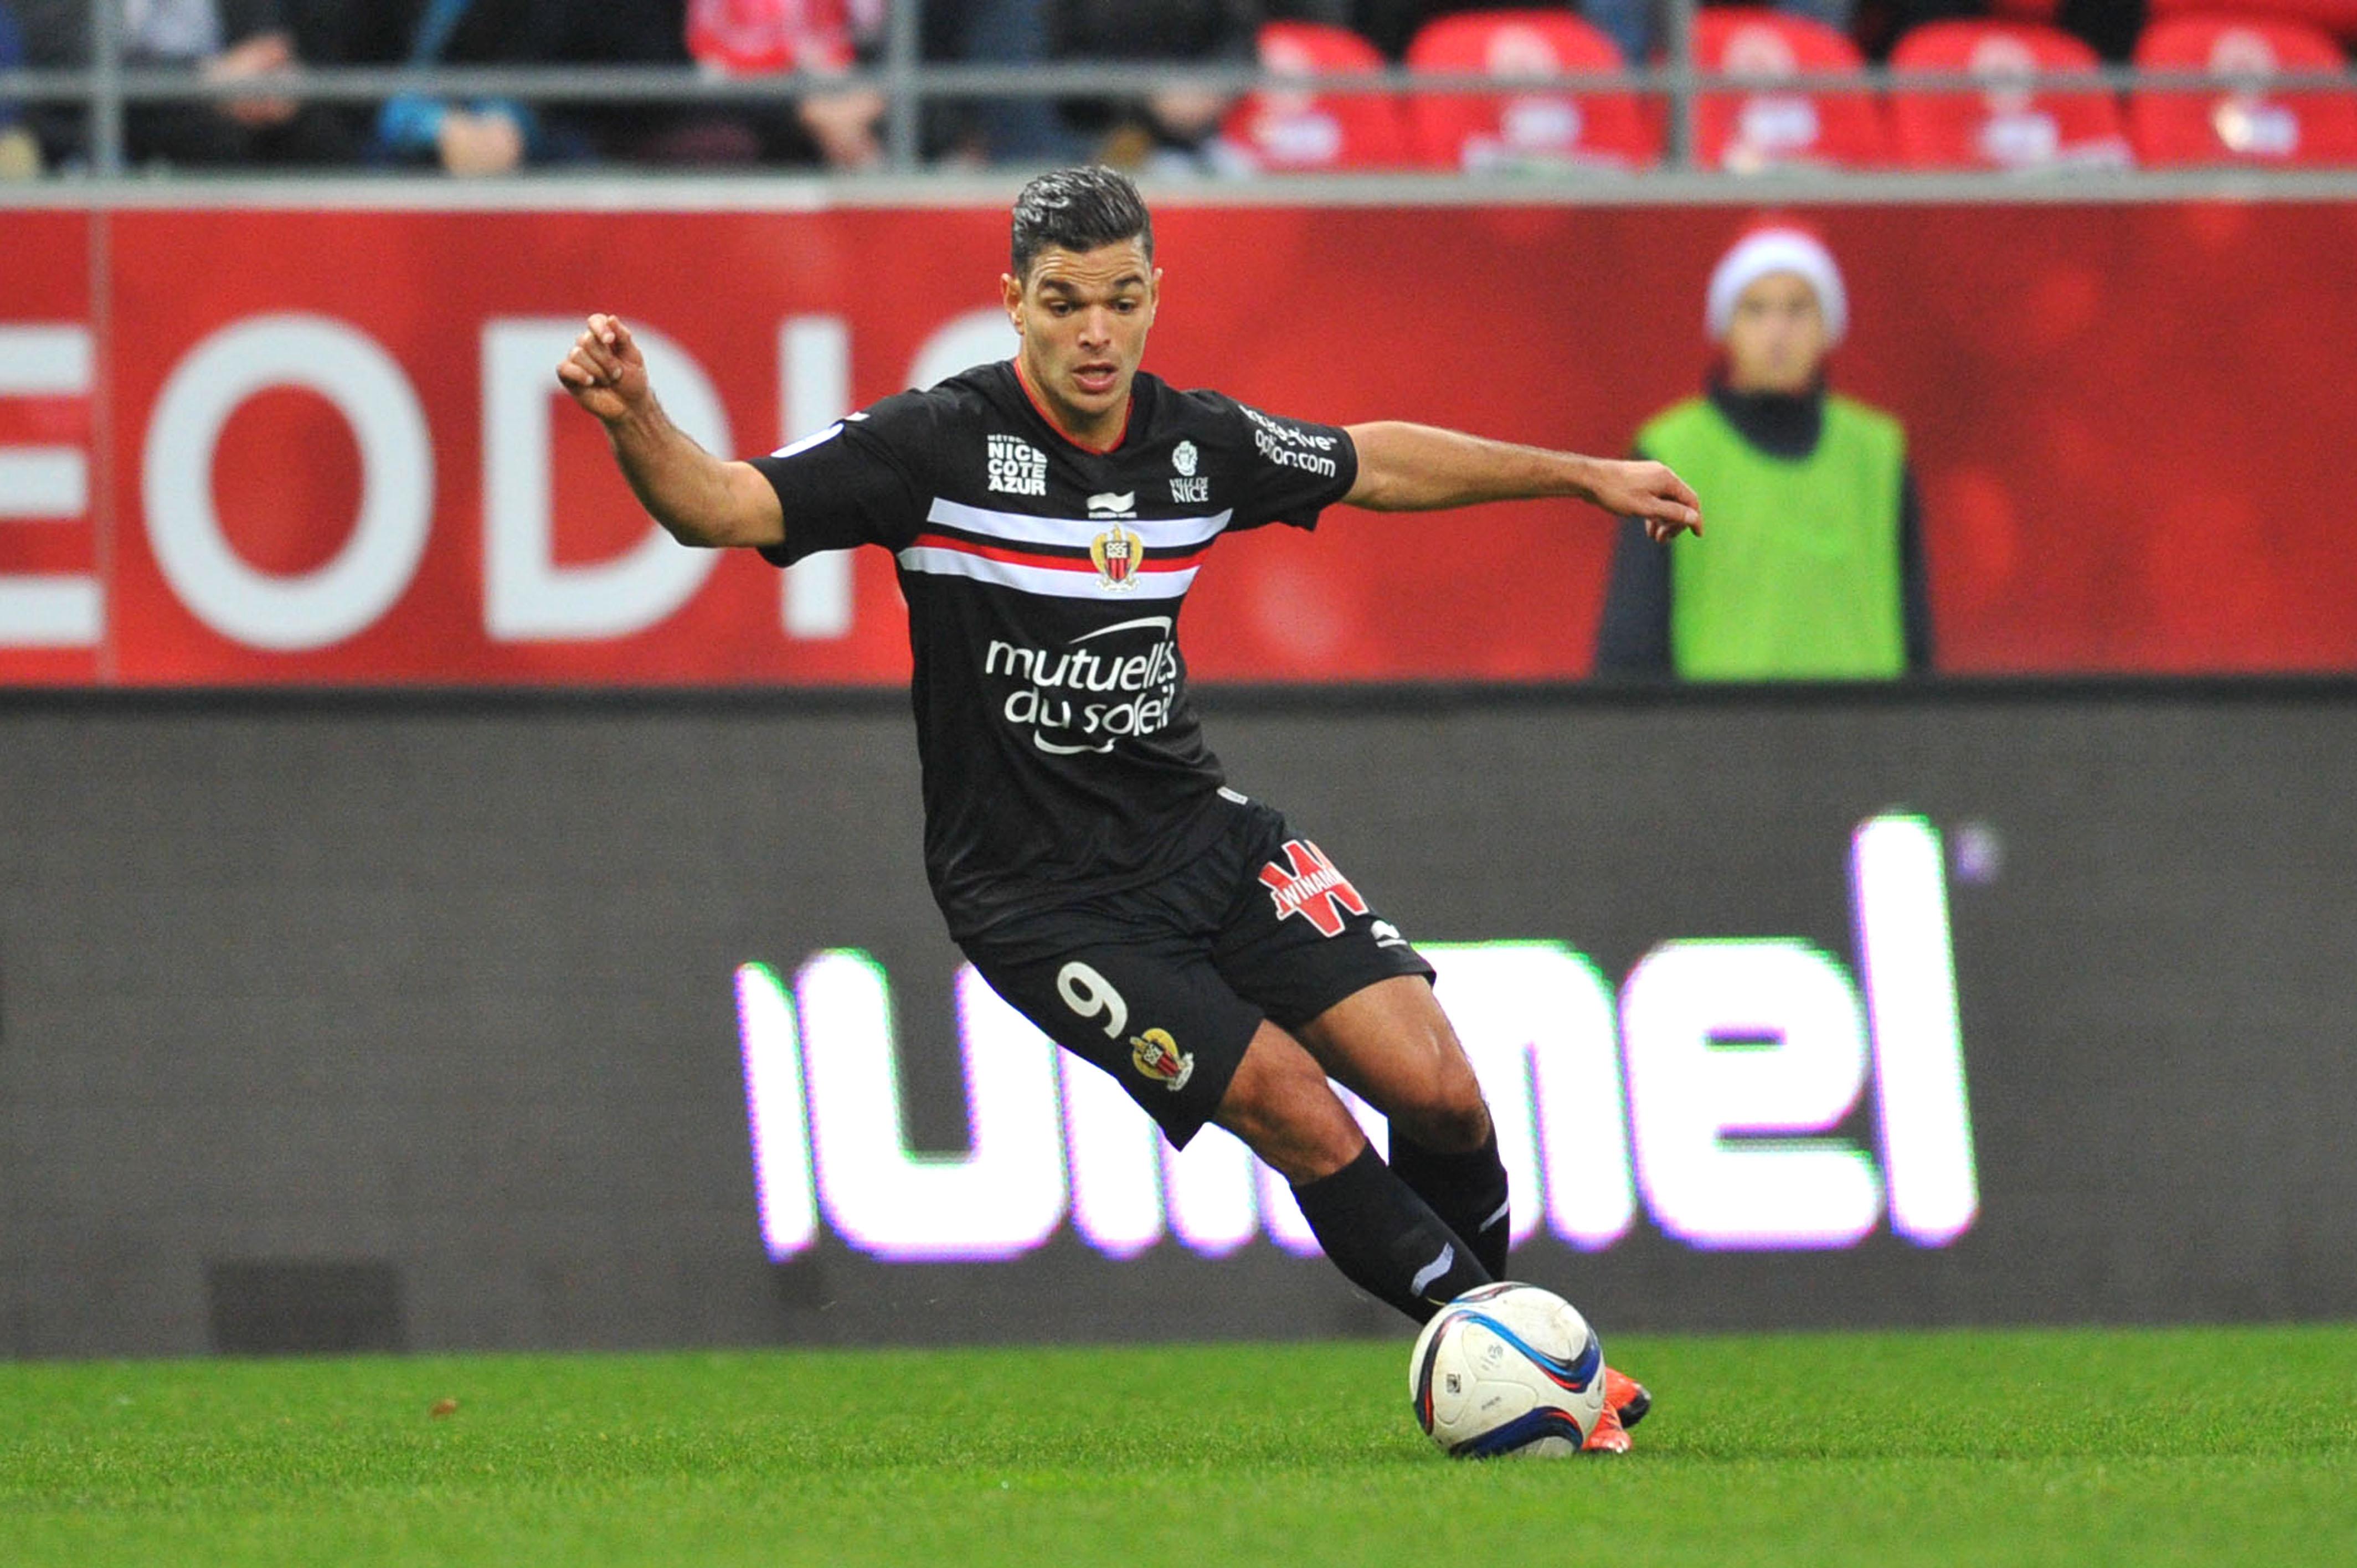 Football - Transferts - Ben Arfa veut tout : gagner l'Euro et signer au PSG